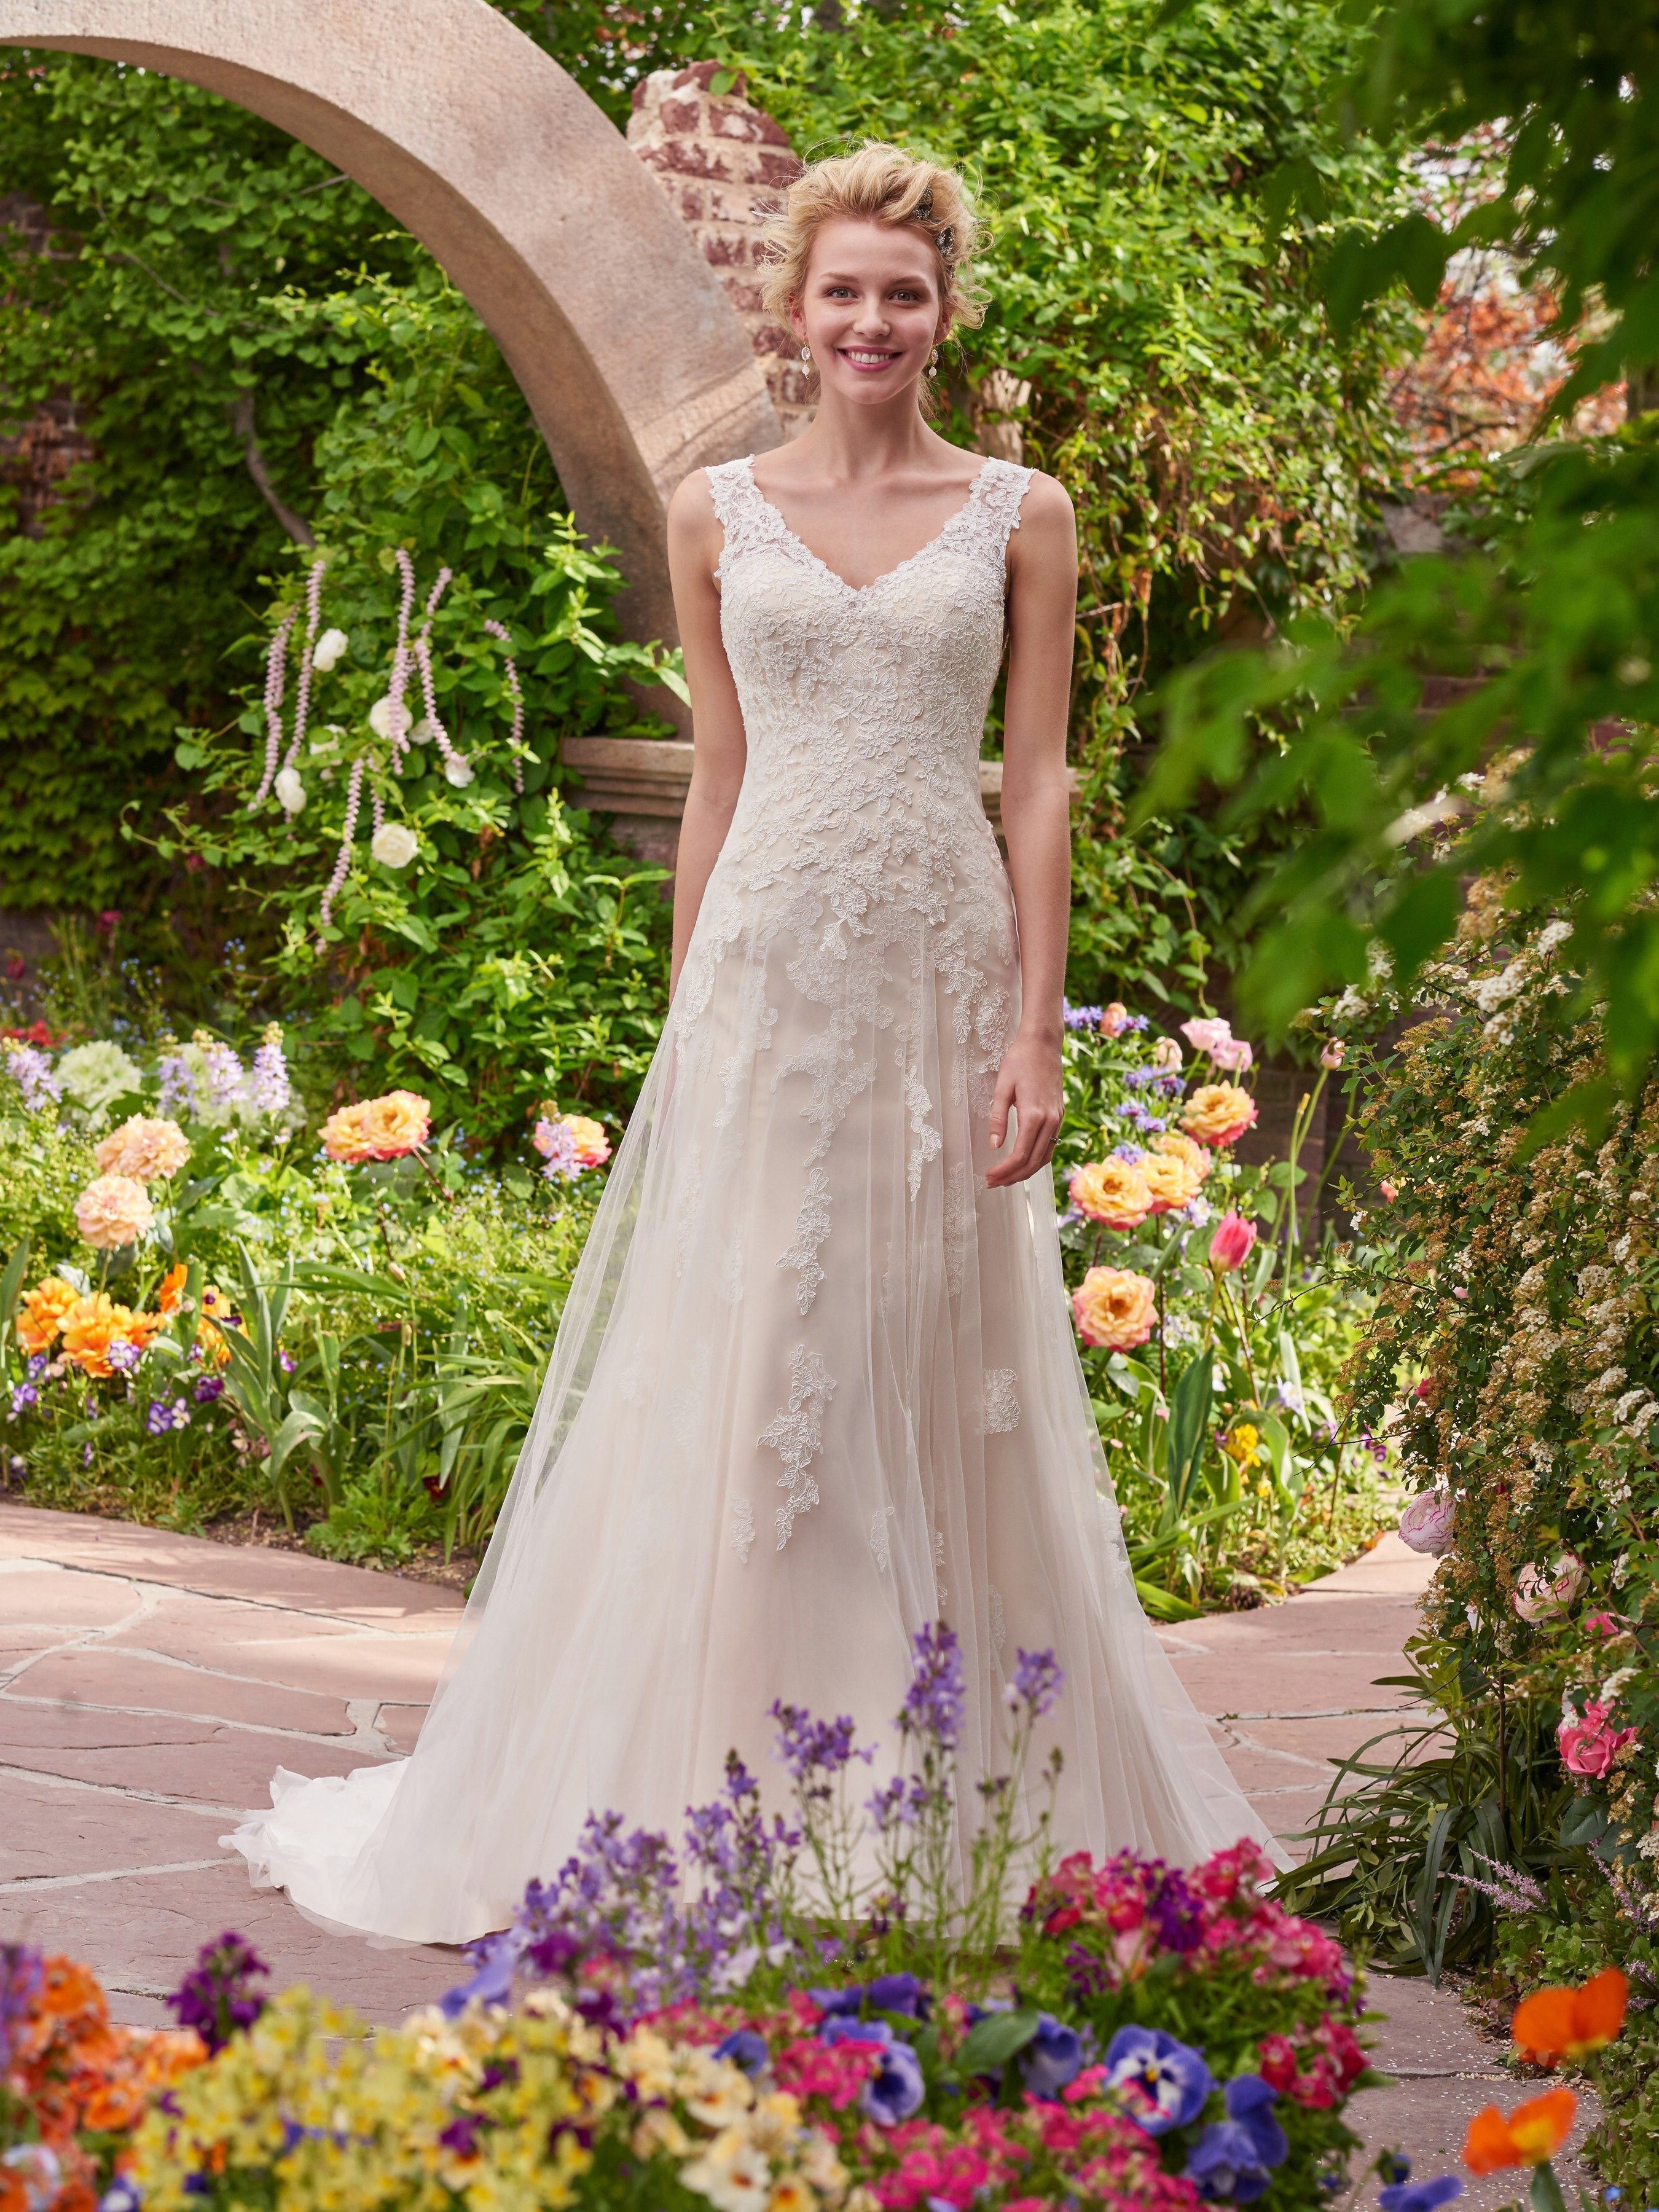 Wedding dresses bridesmaid dresses prom dresses and bridal dresses